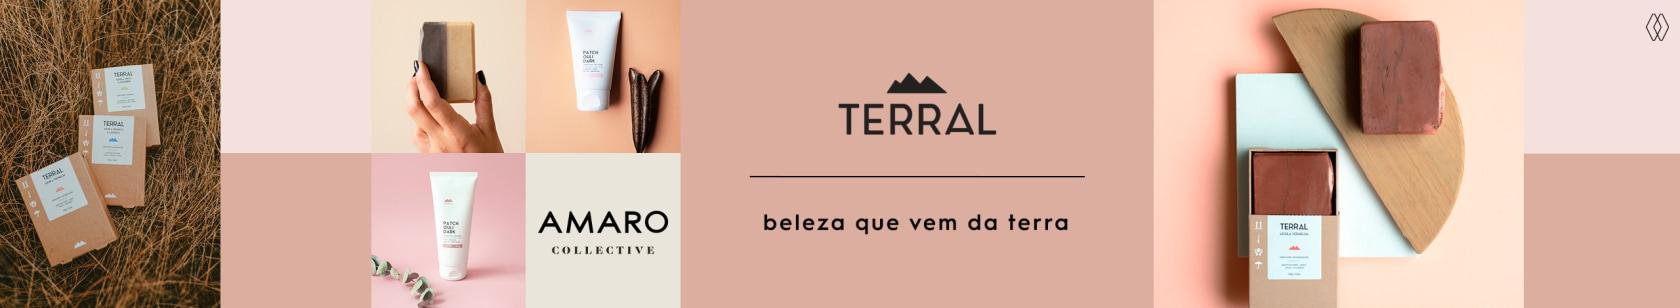 TERRAL | AMARO COLLECTIVE